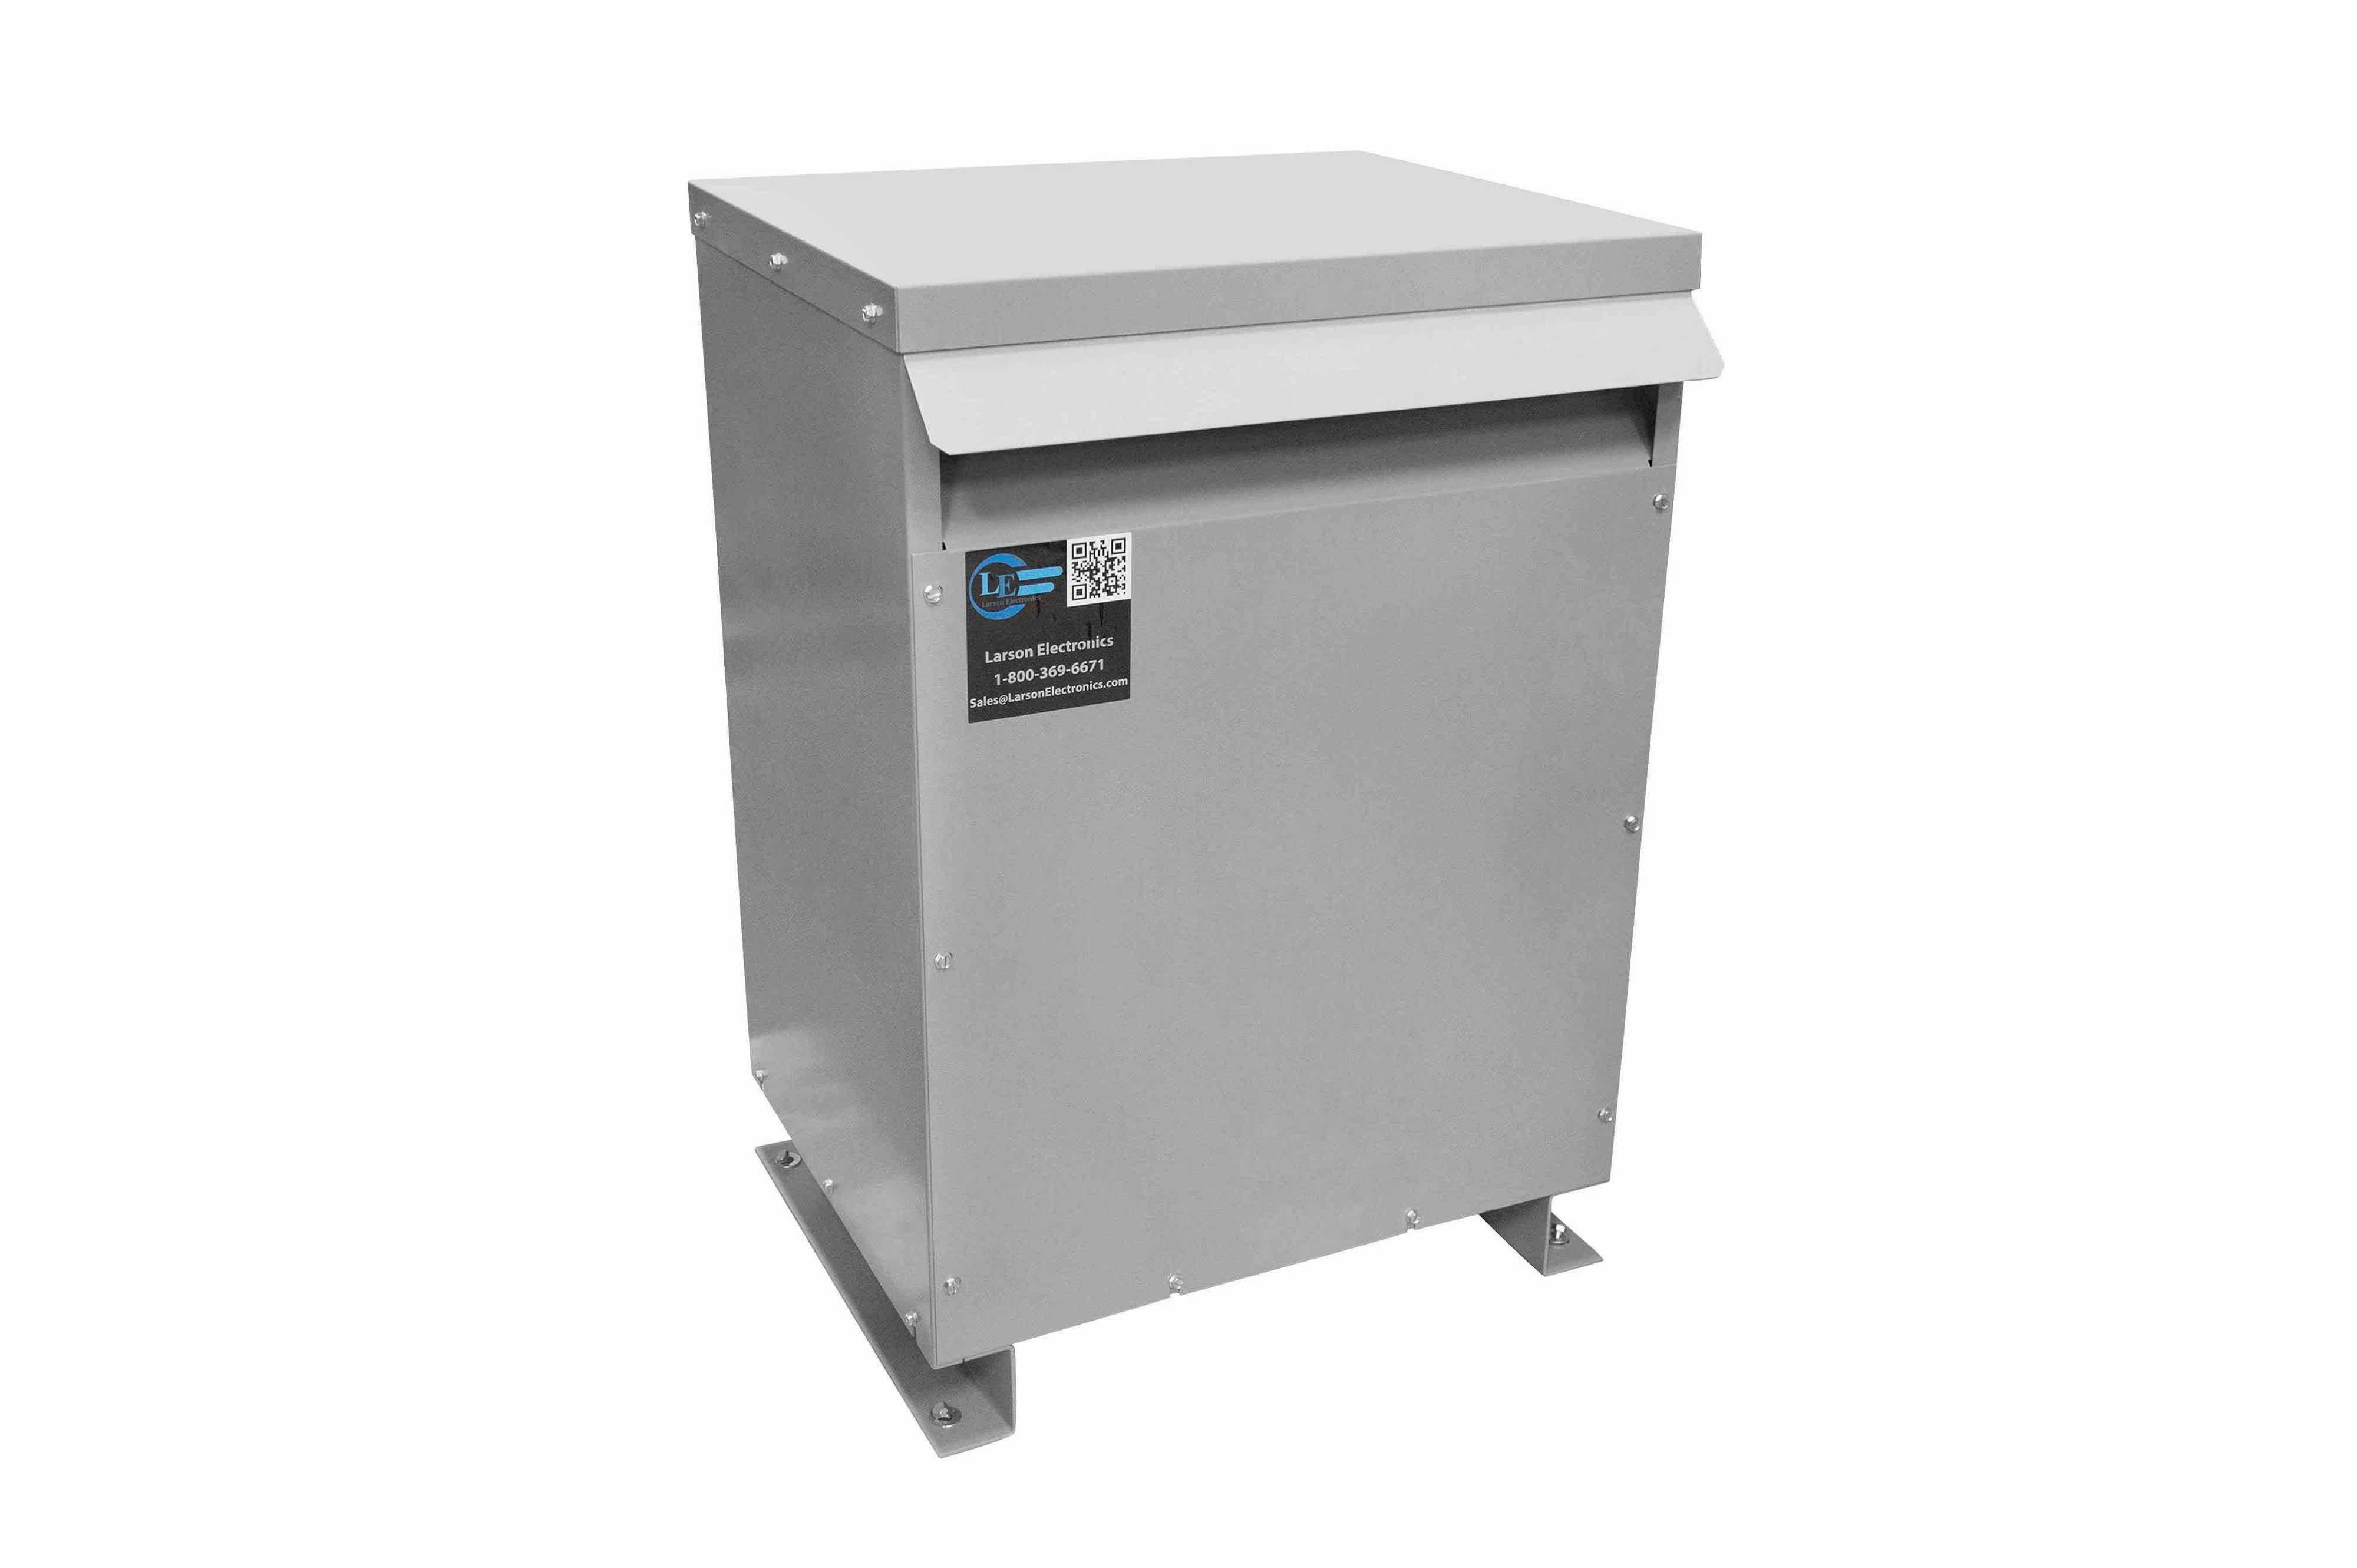 55 kVA 3PH Isolation Transformer, 208V Wye Primary, 480Y/277 Wye-N Secondary, N3R, Ventilated, 60 Hz